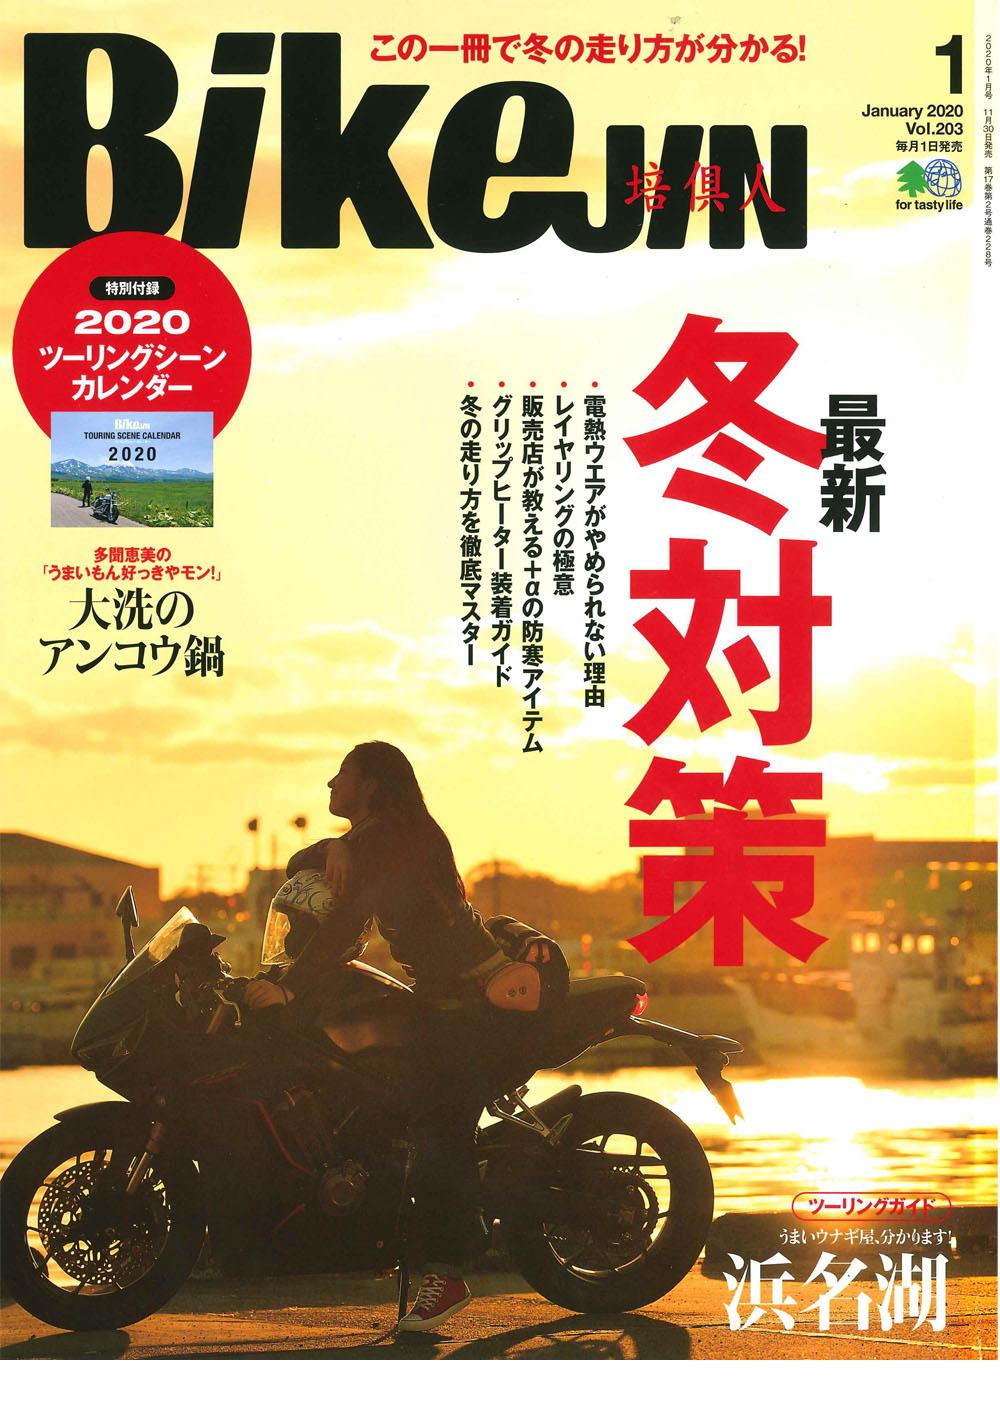 【BikeJIN 1月号掲載】 B+COM U Mobile APP(SB6X用スマホアプリ)